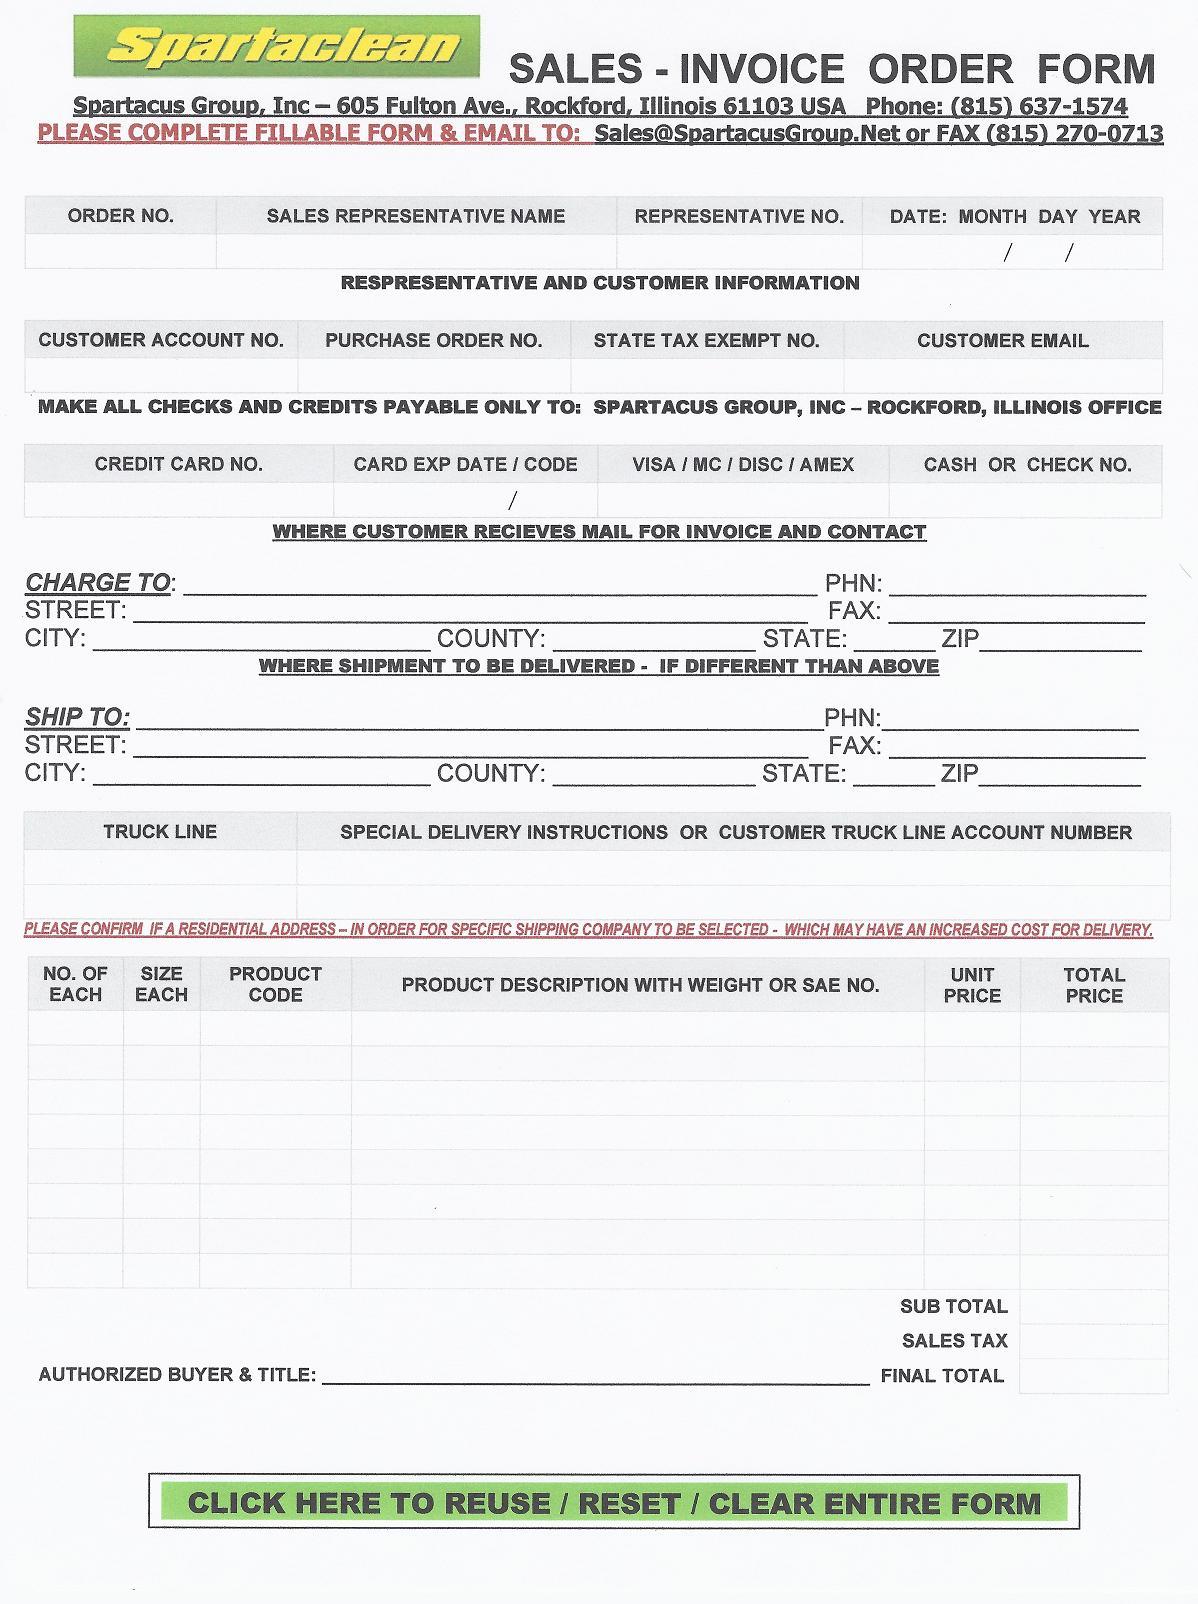 sales order forms